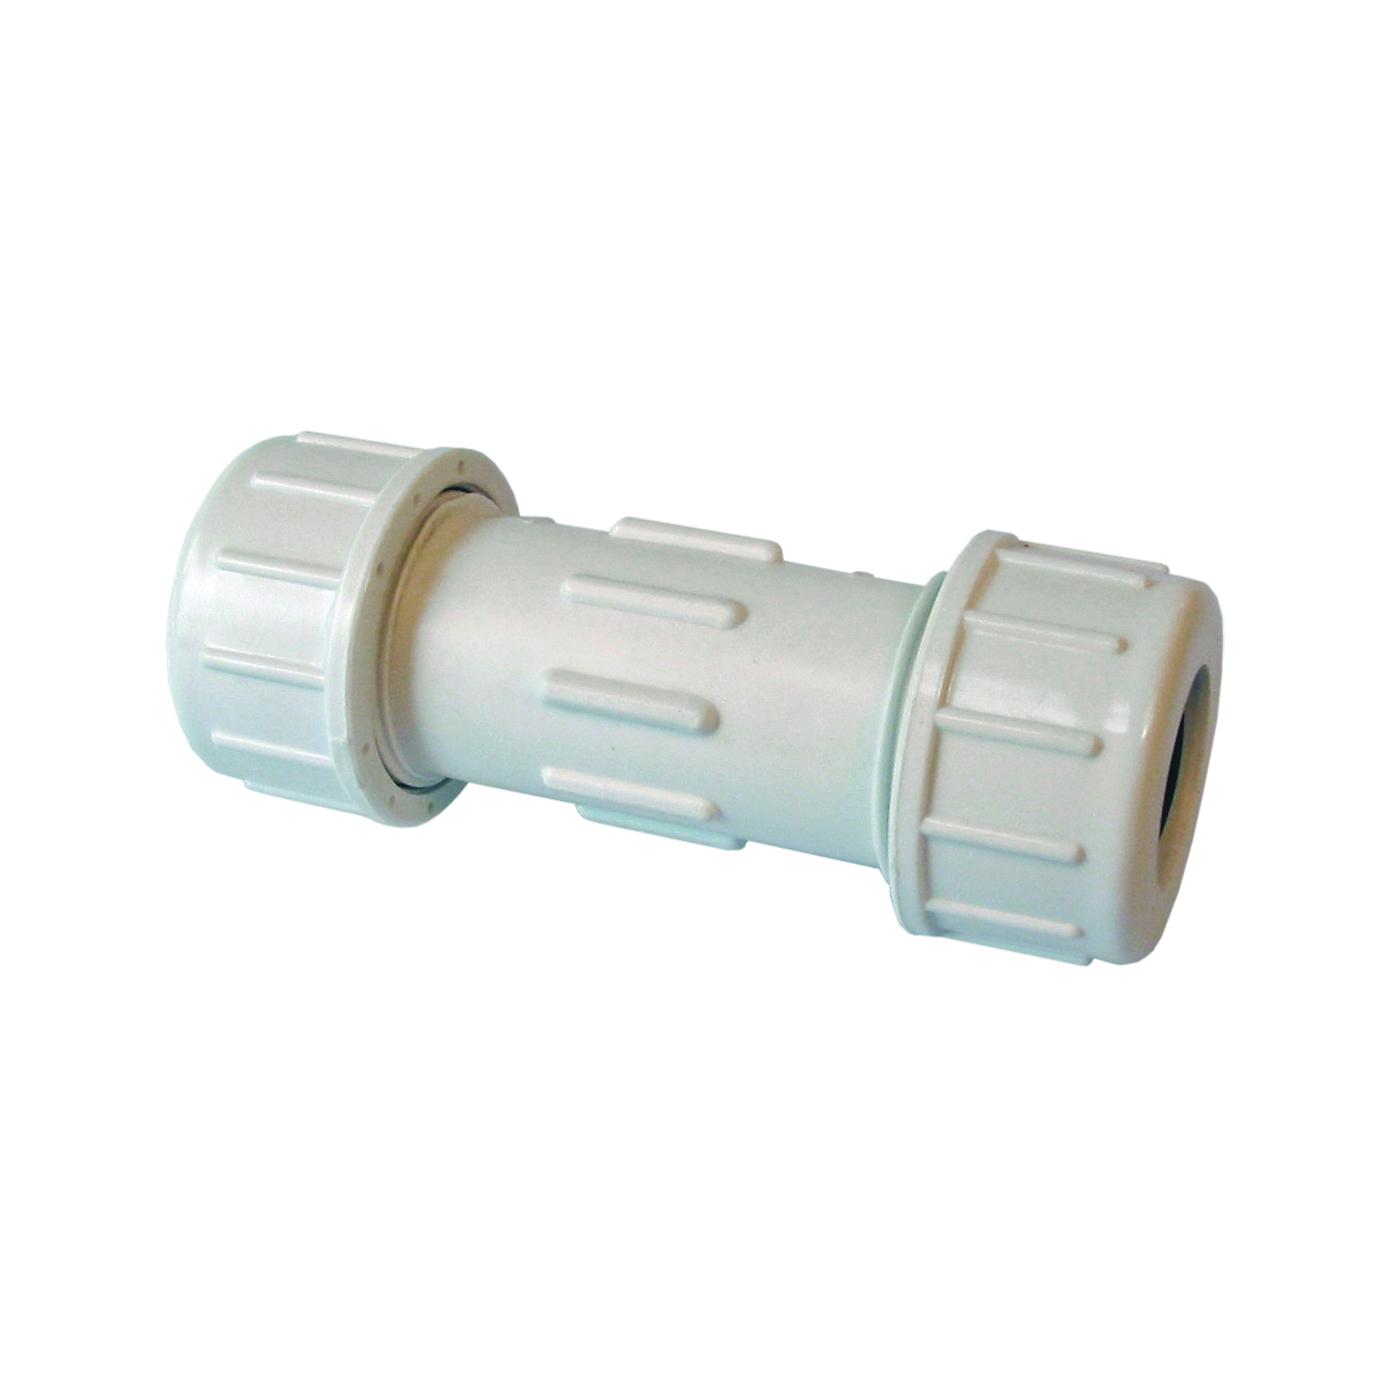 Picture of AMERICAN VALVE P600U 3 Compression Coupler, 3 in, Compression, SCH 40 Schedule, 150 psi Pressure